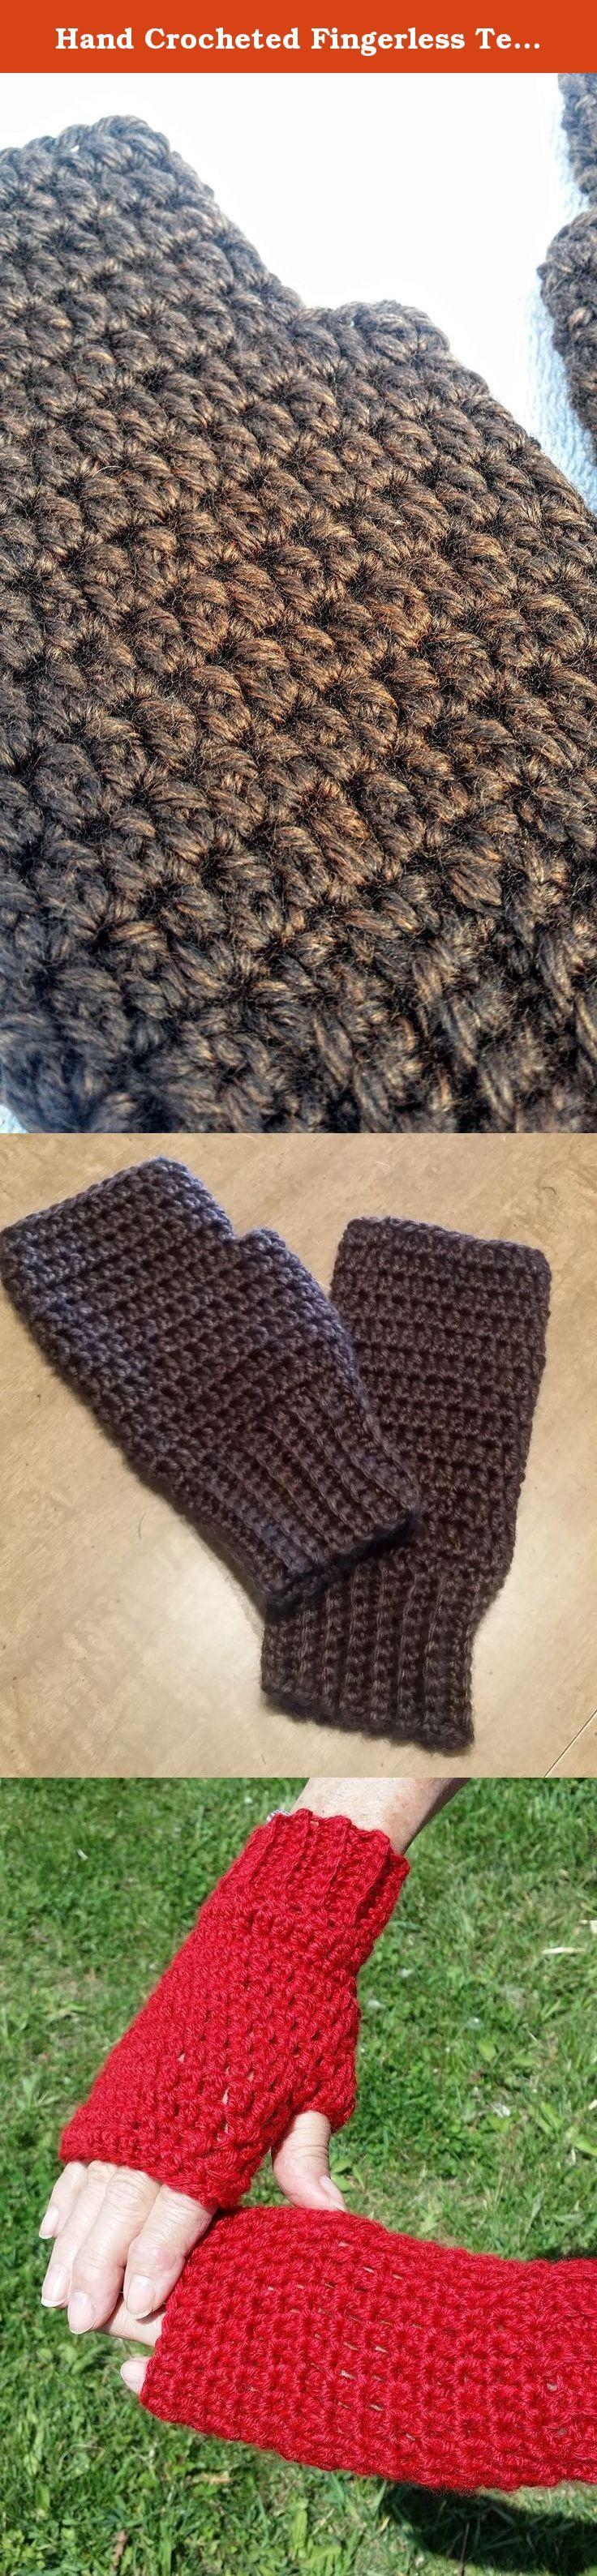 Fingerless gloves eso - Hand Crocheted Fingerless Texting Gloves Arthritis Fibromyalgia Hand Warmers Rich Brown These Gloves